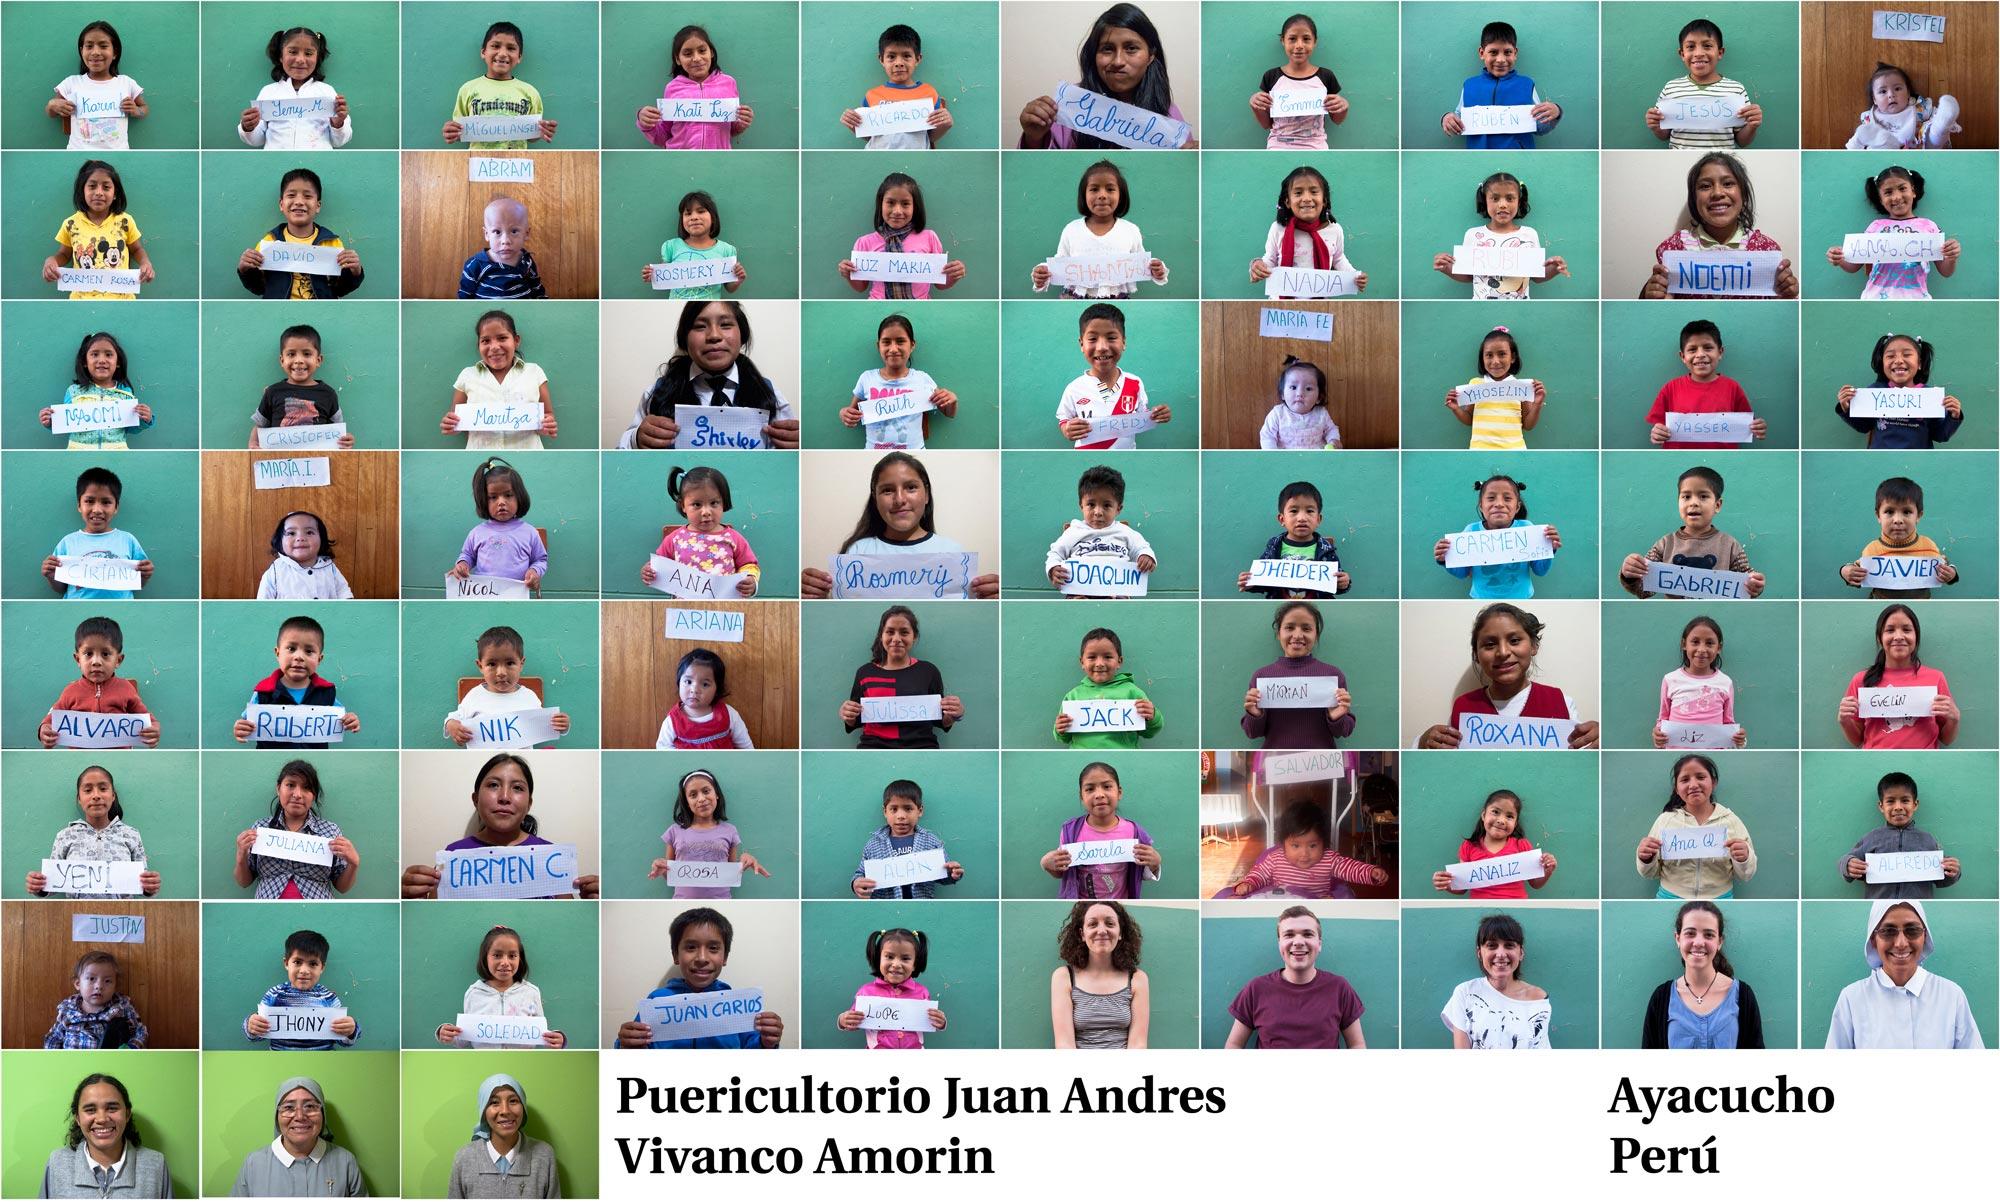 Peru Ayacucho Puericultorio kids poster